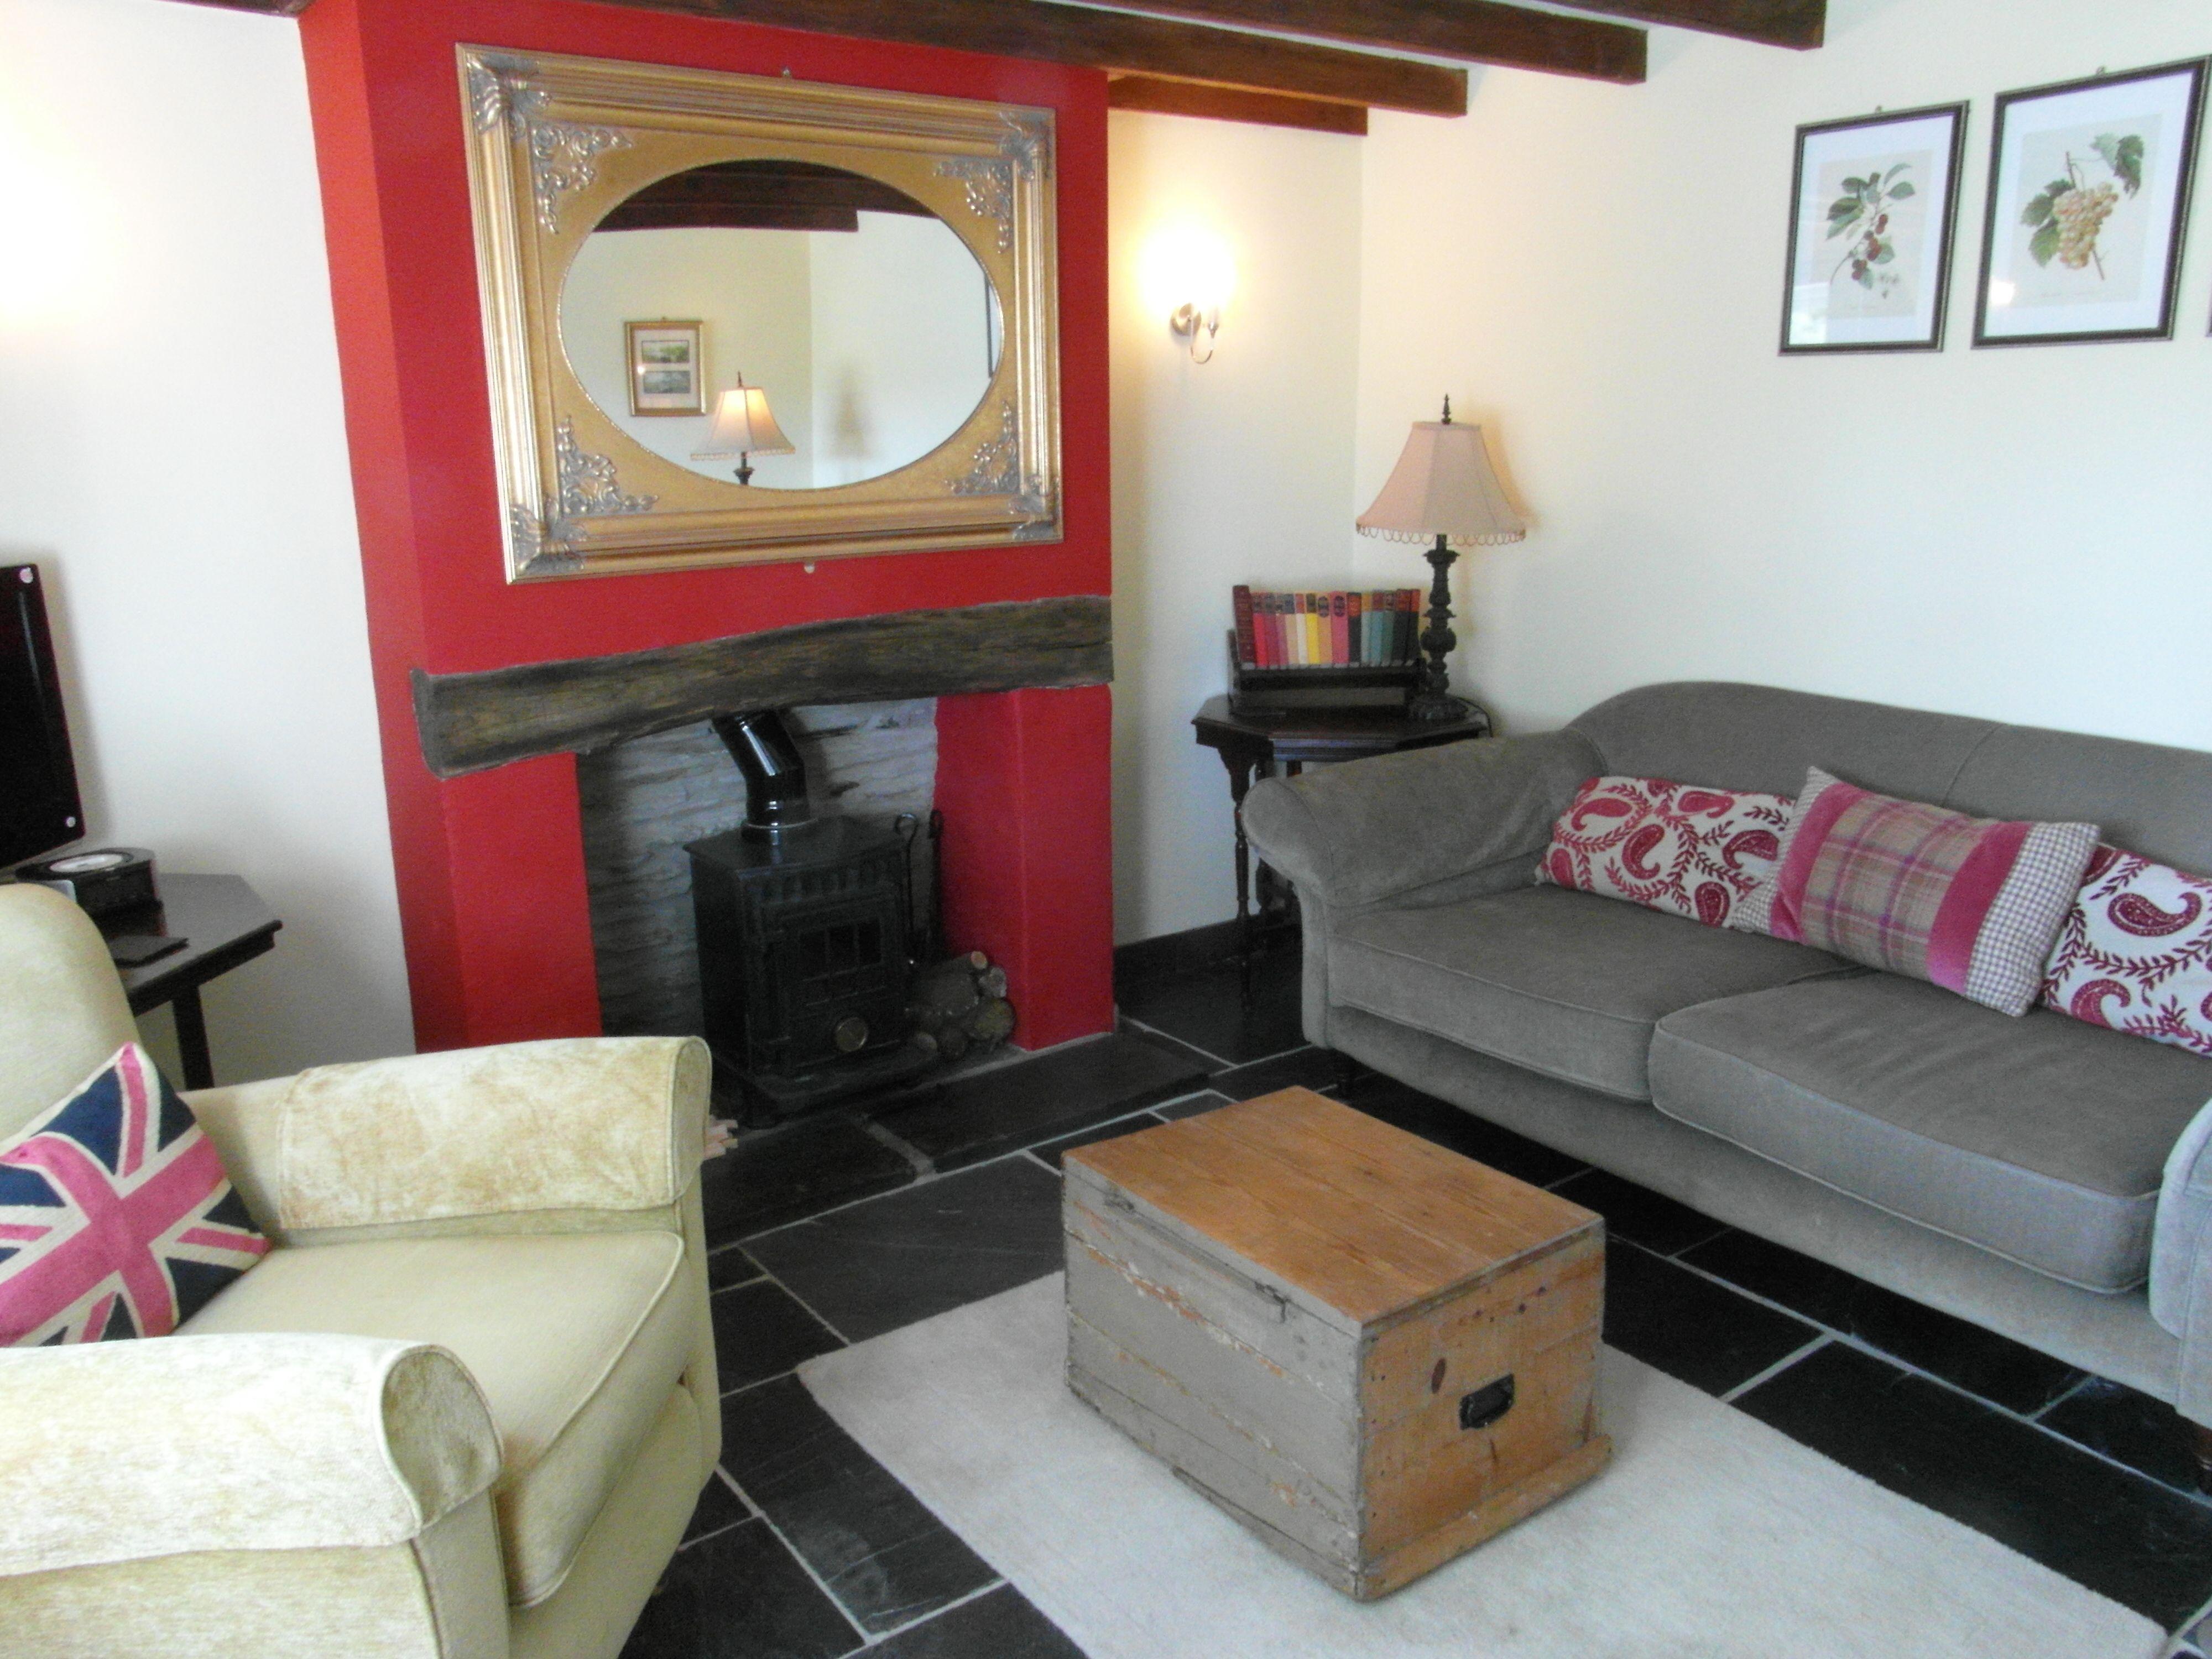 Cottage sitting room fy sofa chairs toasty log burner TV DVD